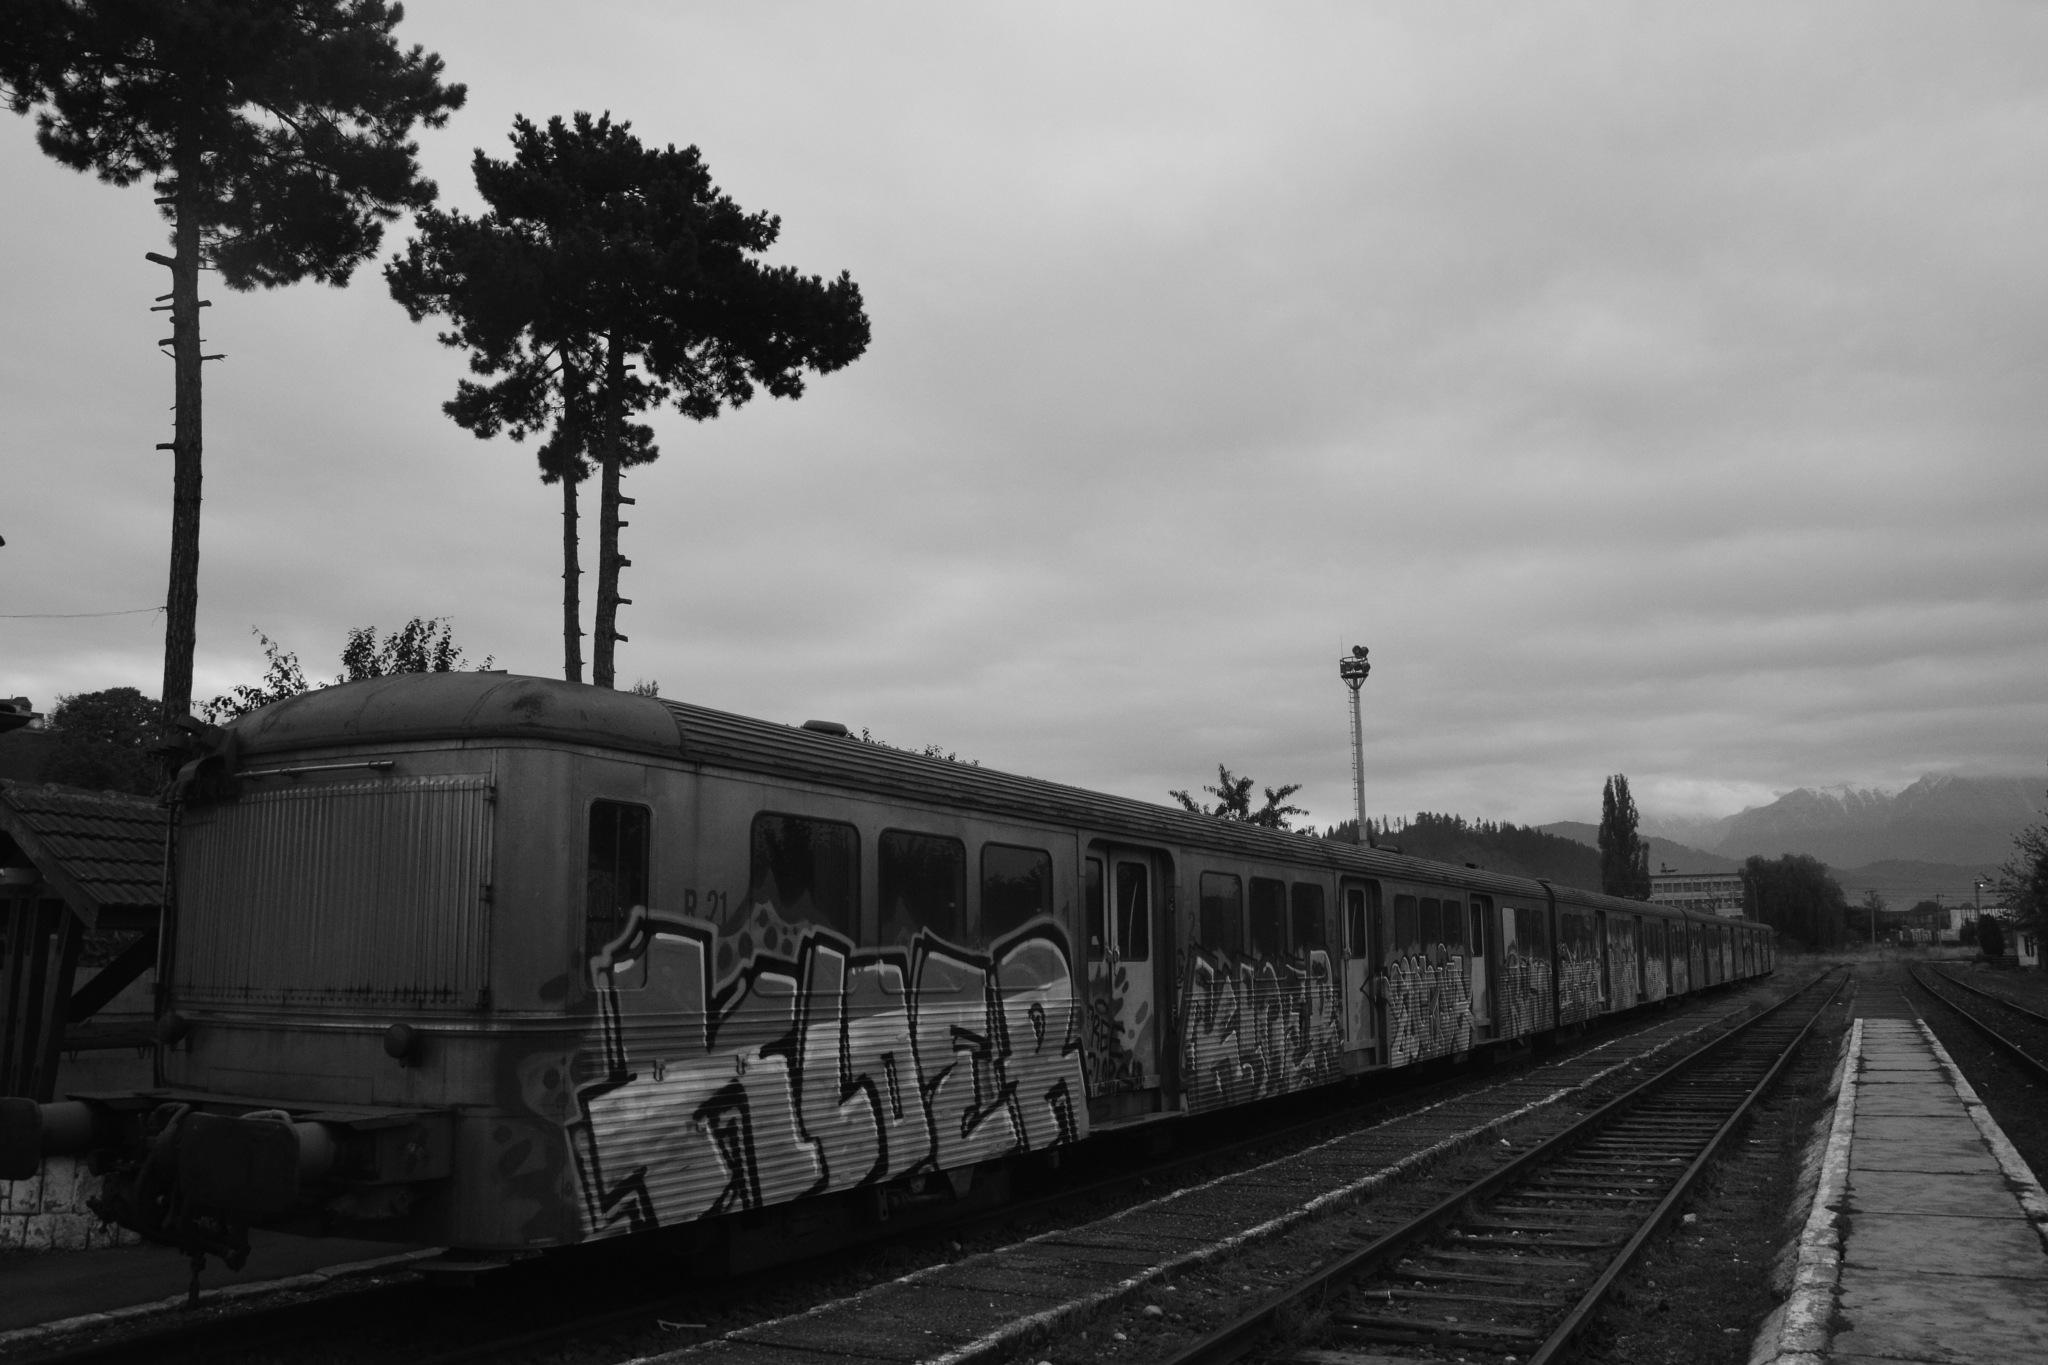 Rasnov Railway Station 5 by GraemeLeePollard